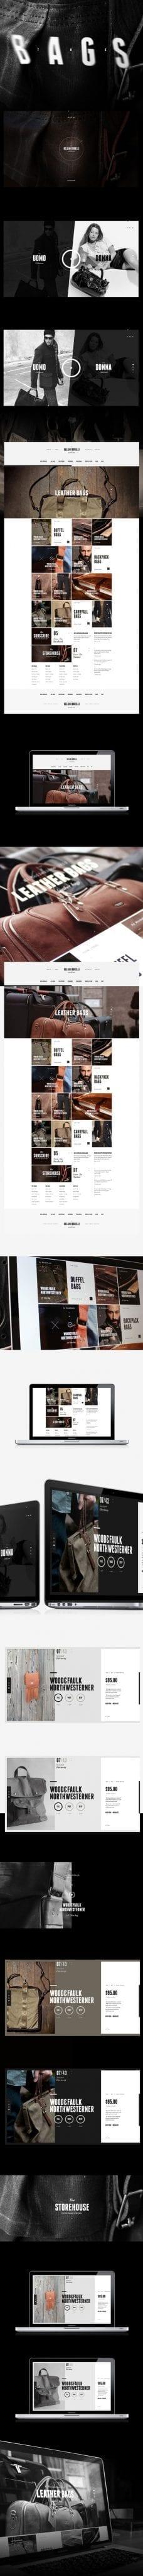 BELLINI BORELLI Website Design